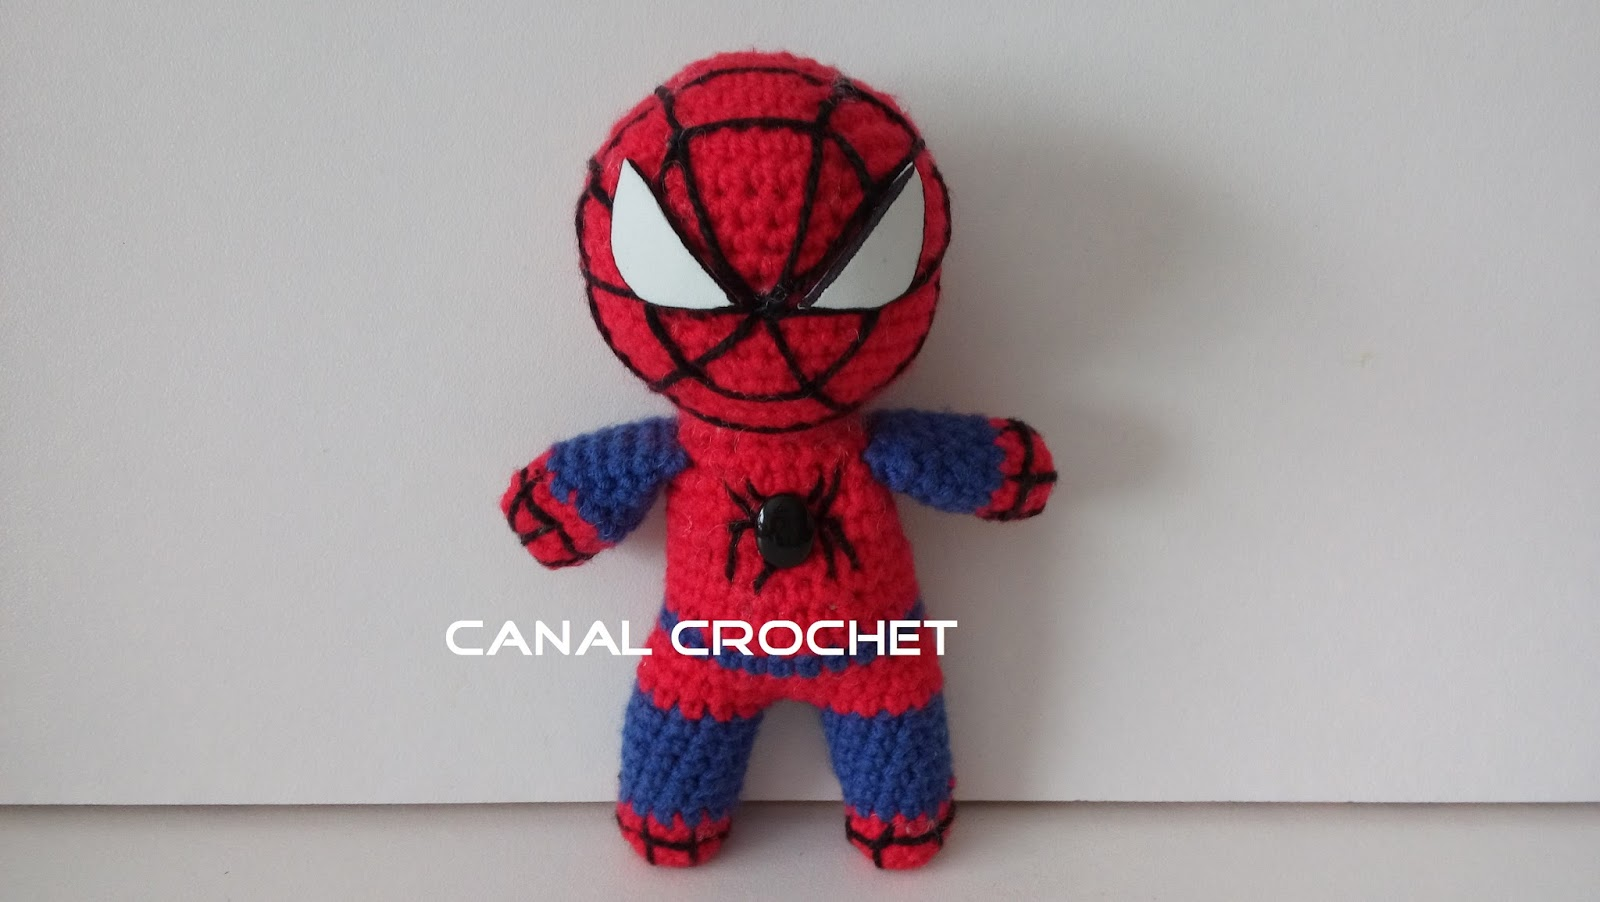 CANAL CROCHET: Super Heroes amigurumi patron libre.